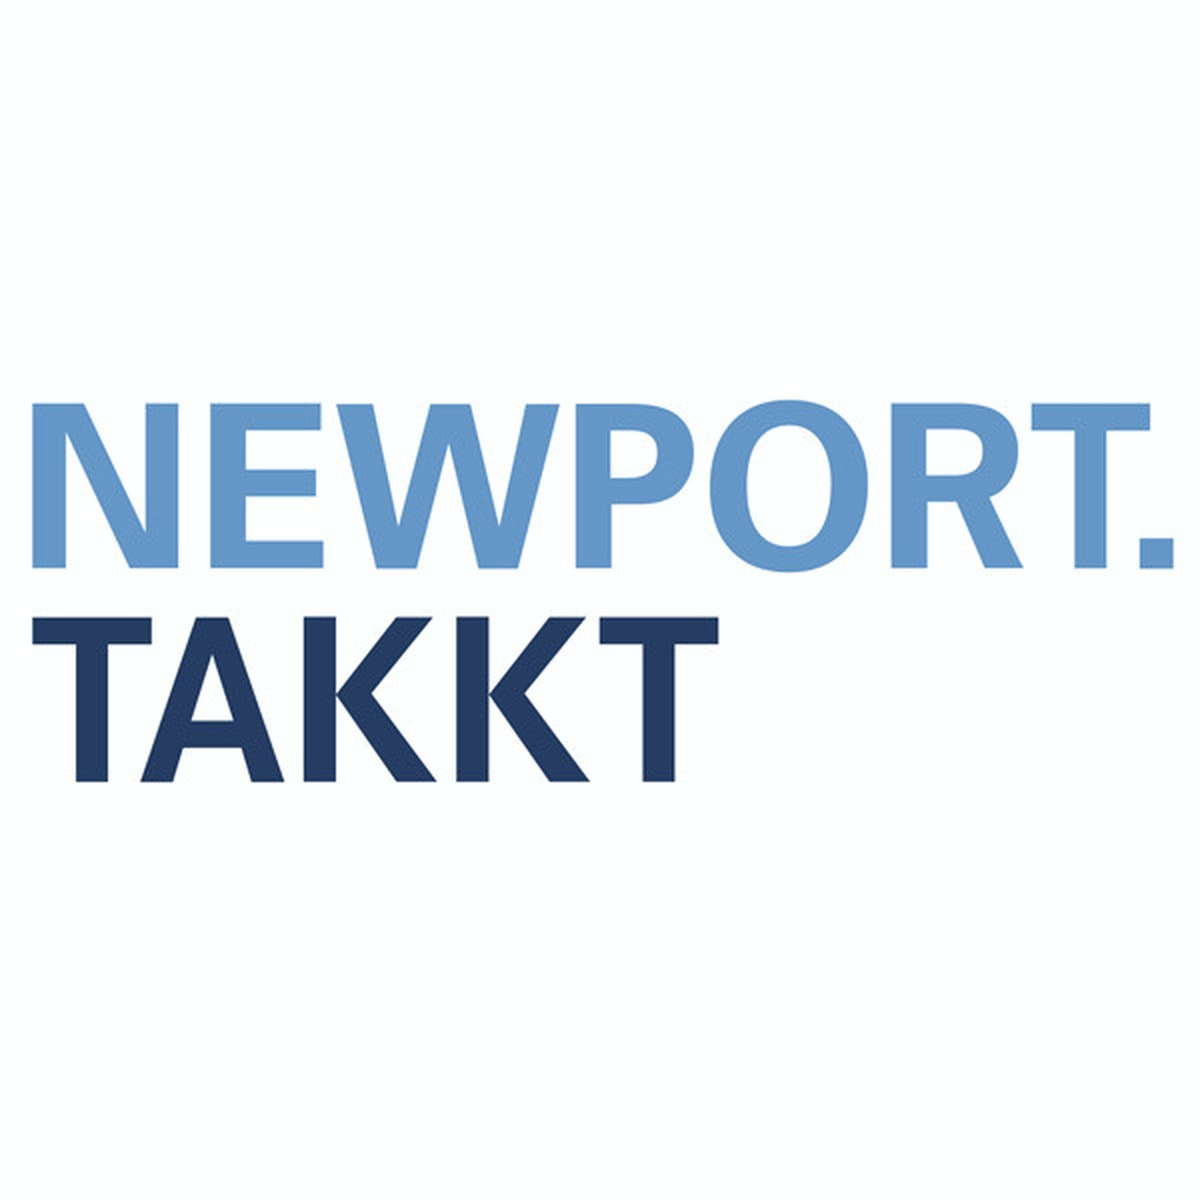 newport.takkt GmbH